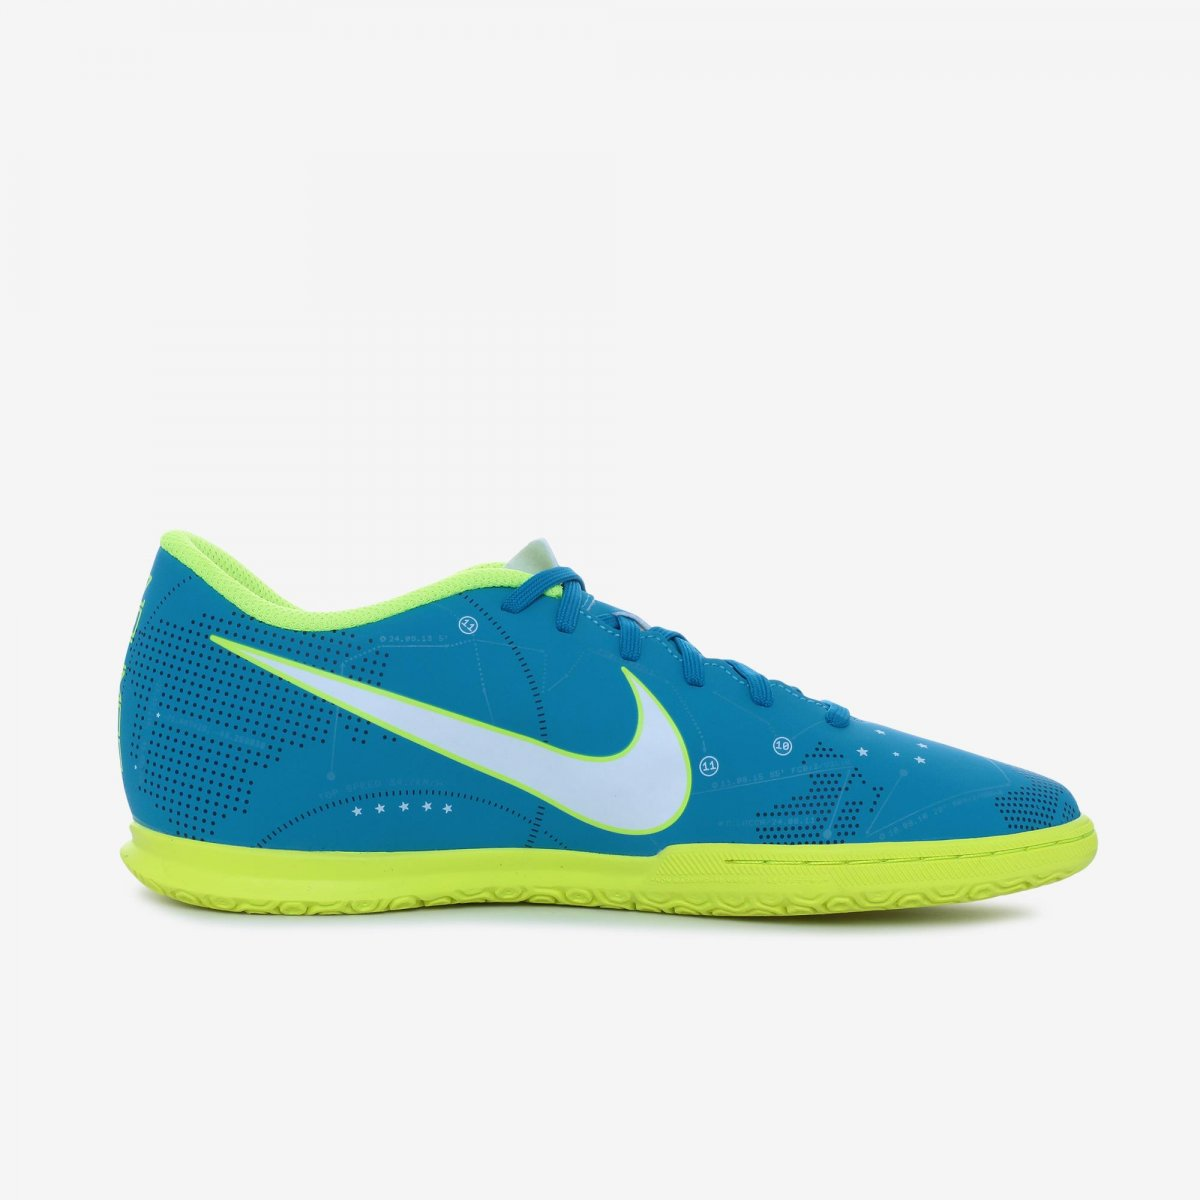 20d1ba0766 Bizz Store - Chuteira Futsal Nike MercurialX Vortex III Neymar